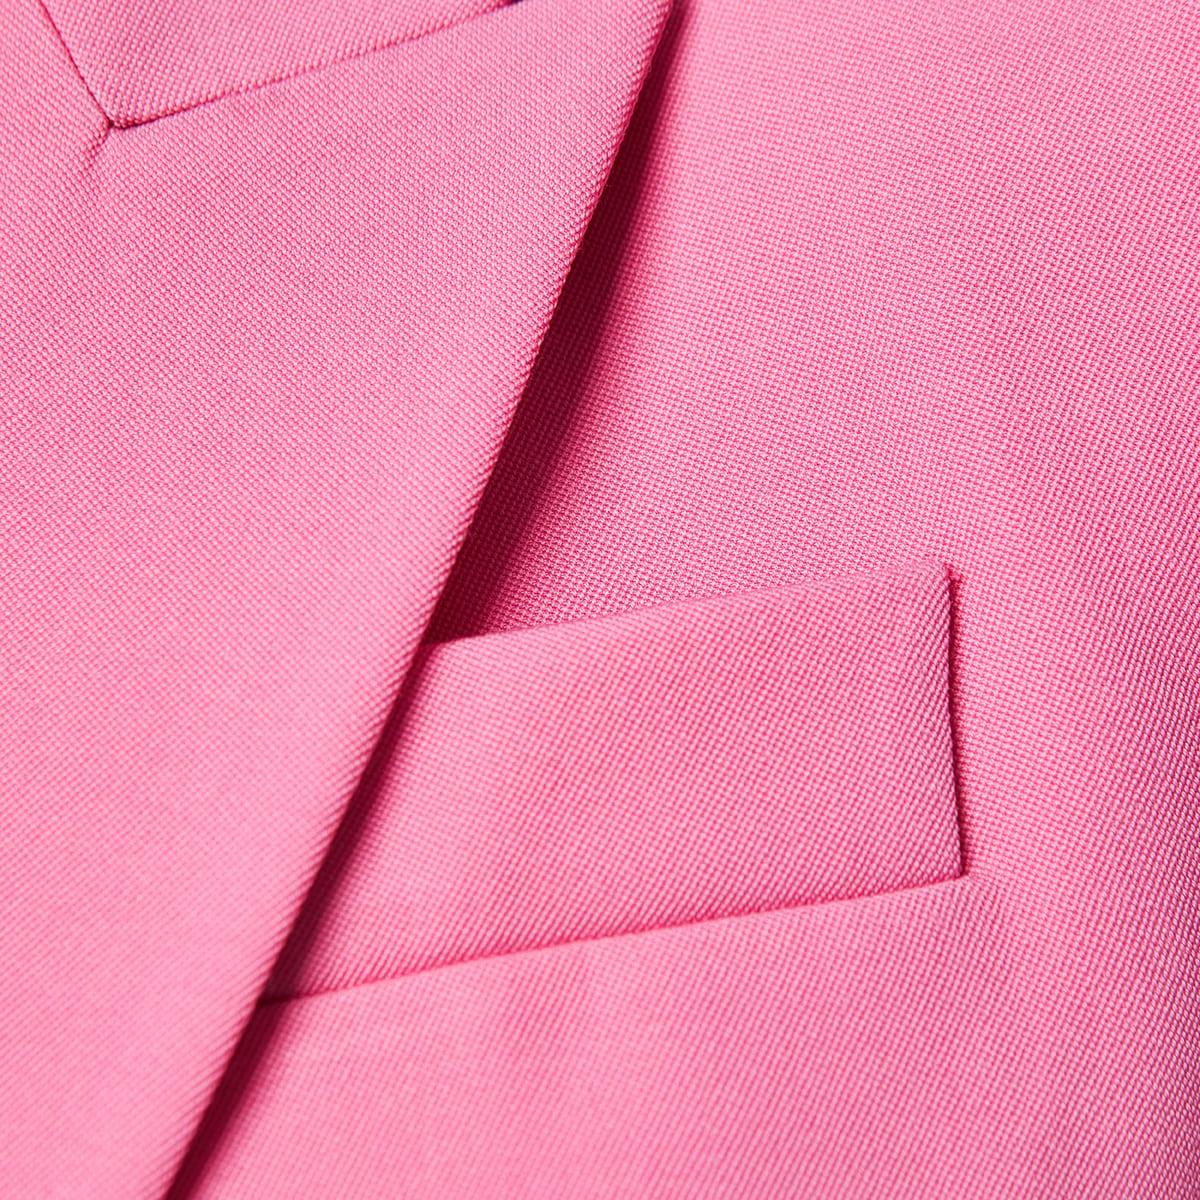 Single-breasted crepe blazer